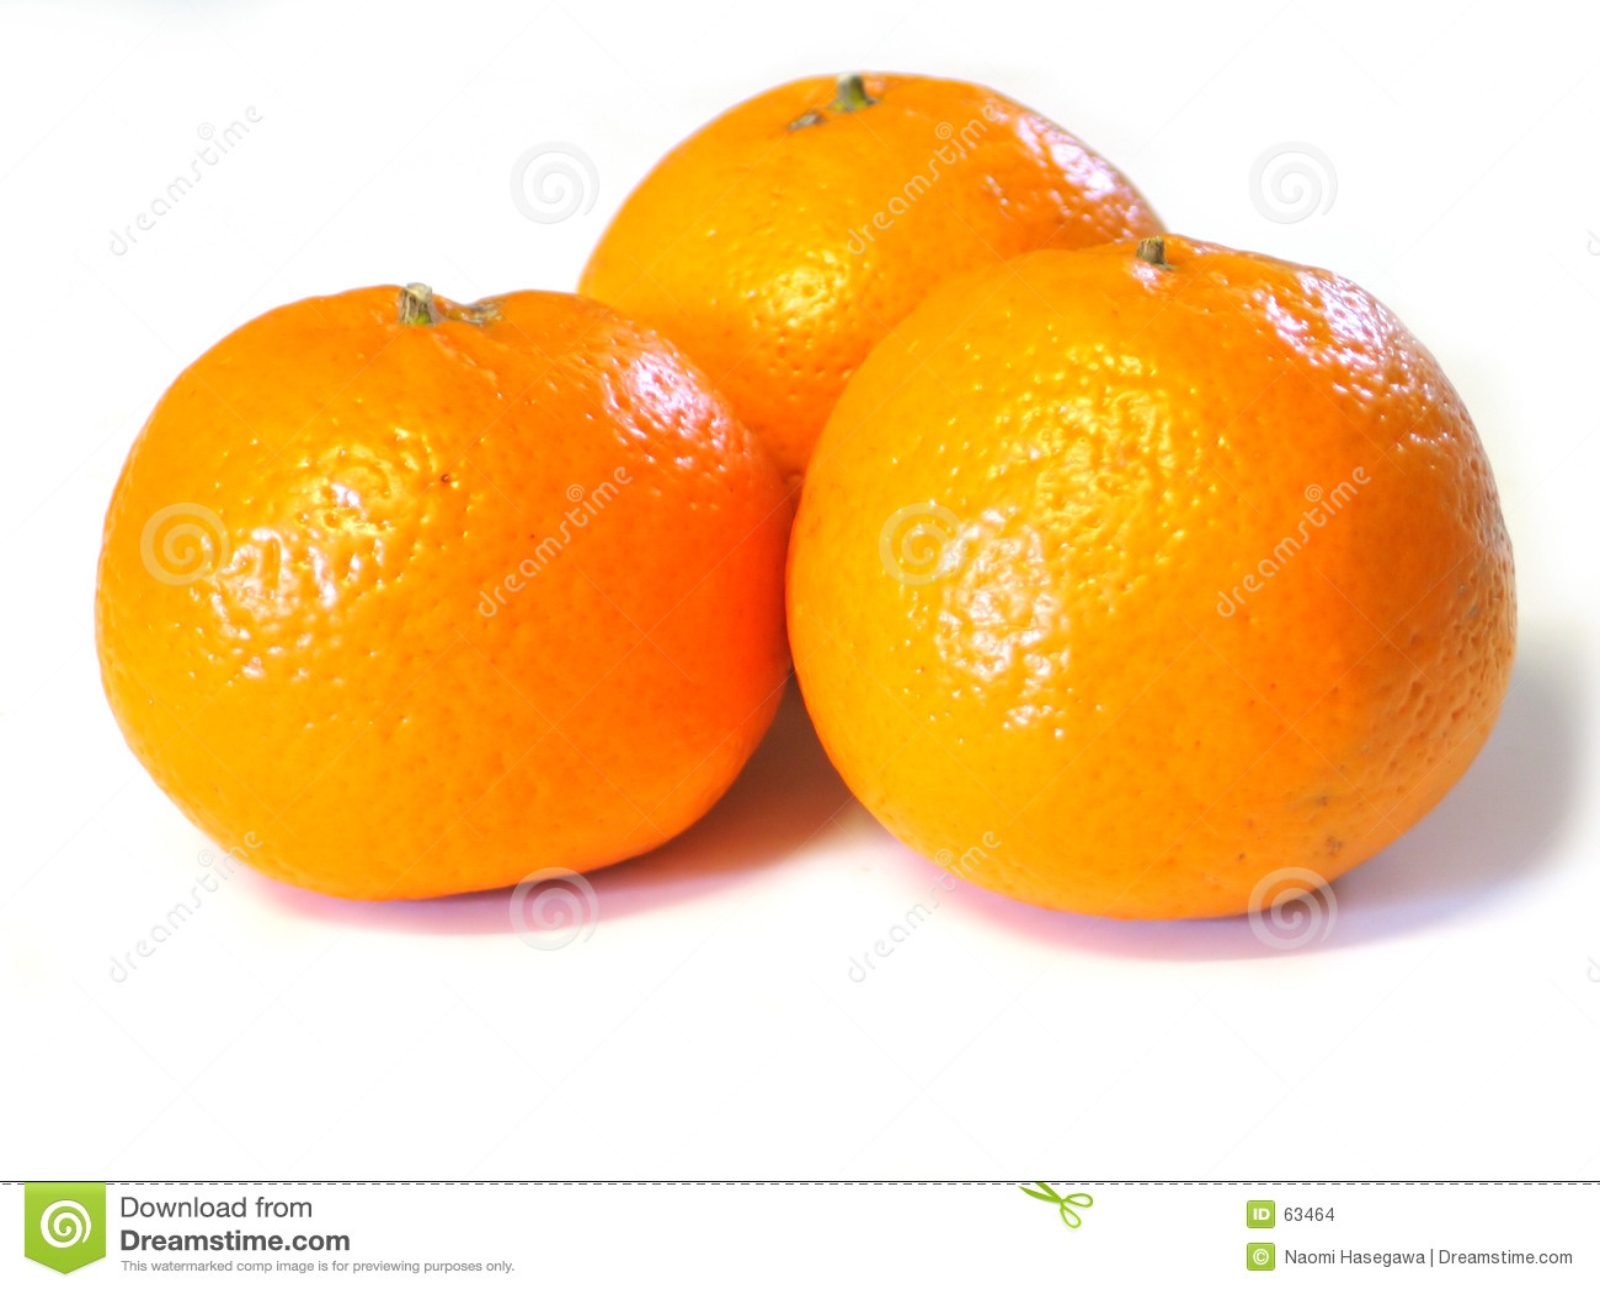 how to grow mangarin seeds from a mandarin